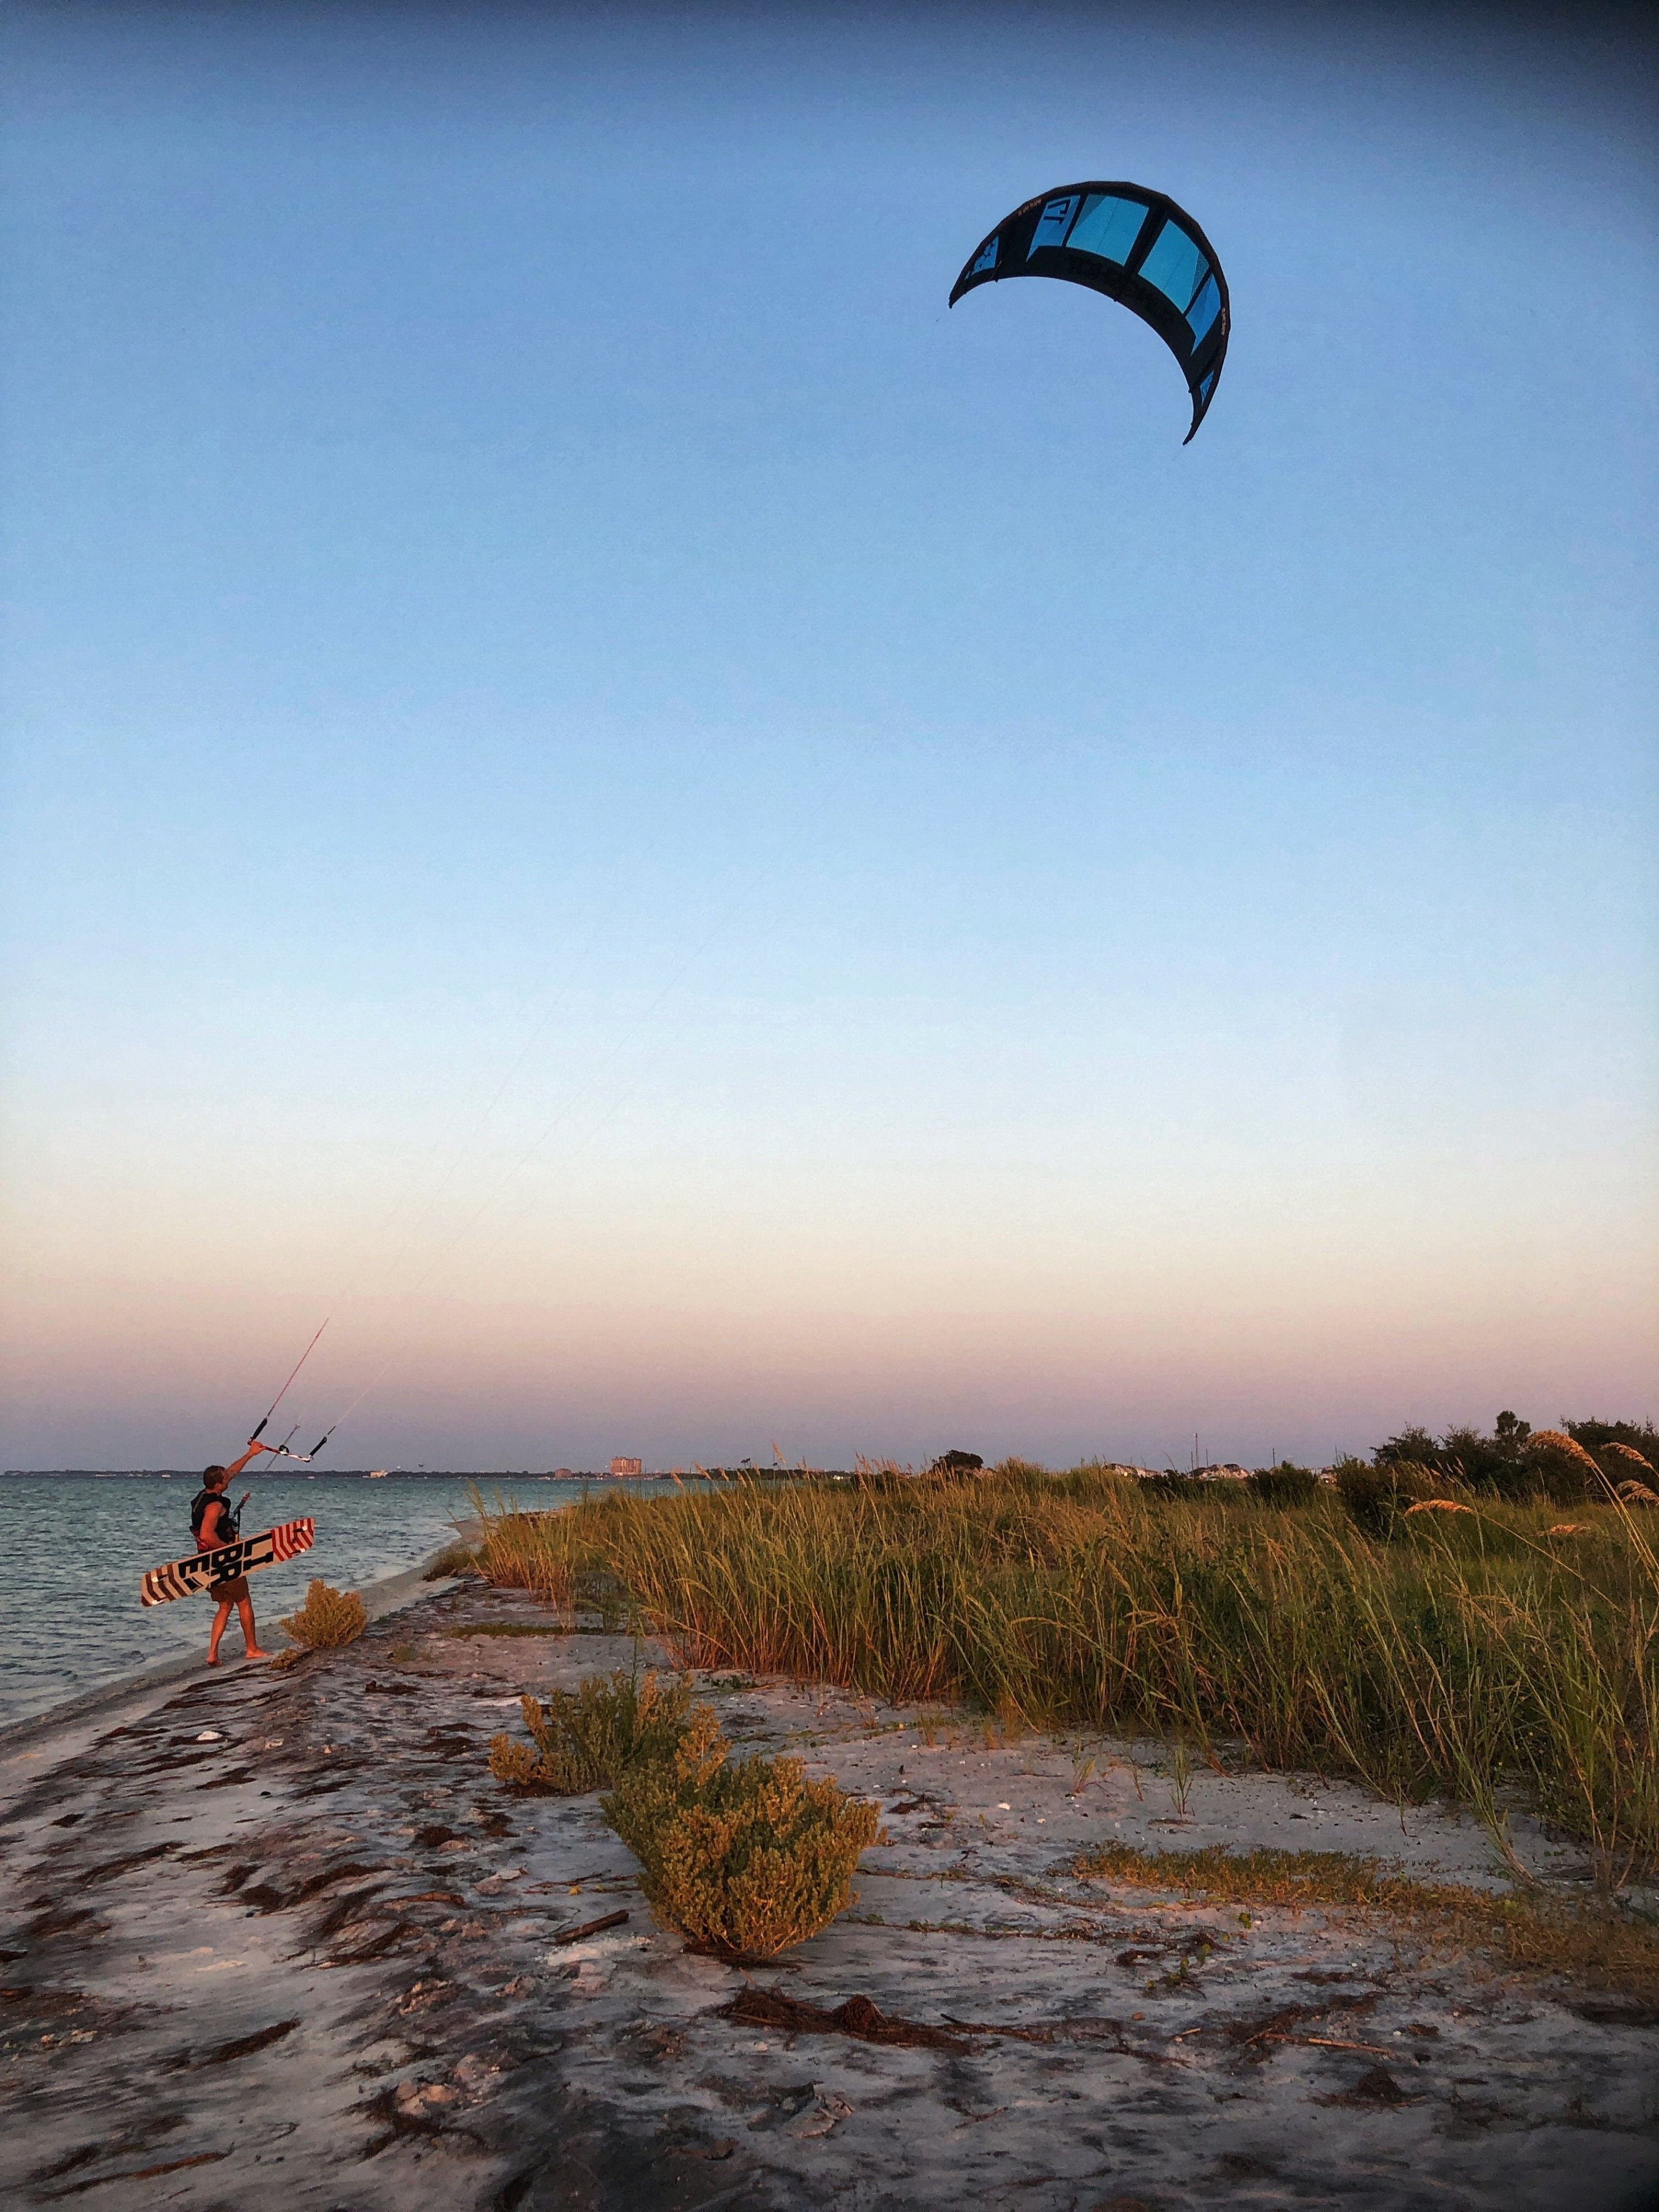 Fort Walton Beach Park, Okaloosa Island, Florida, USA